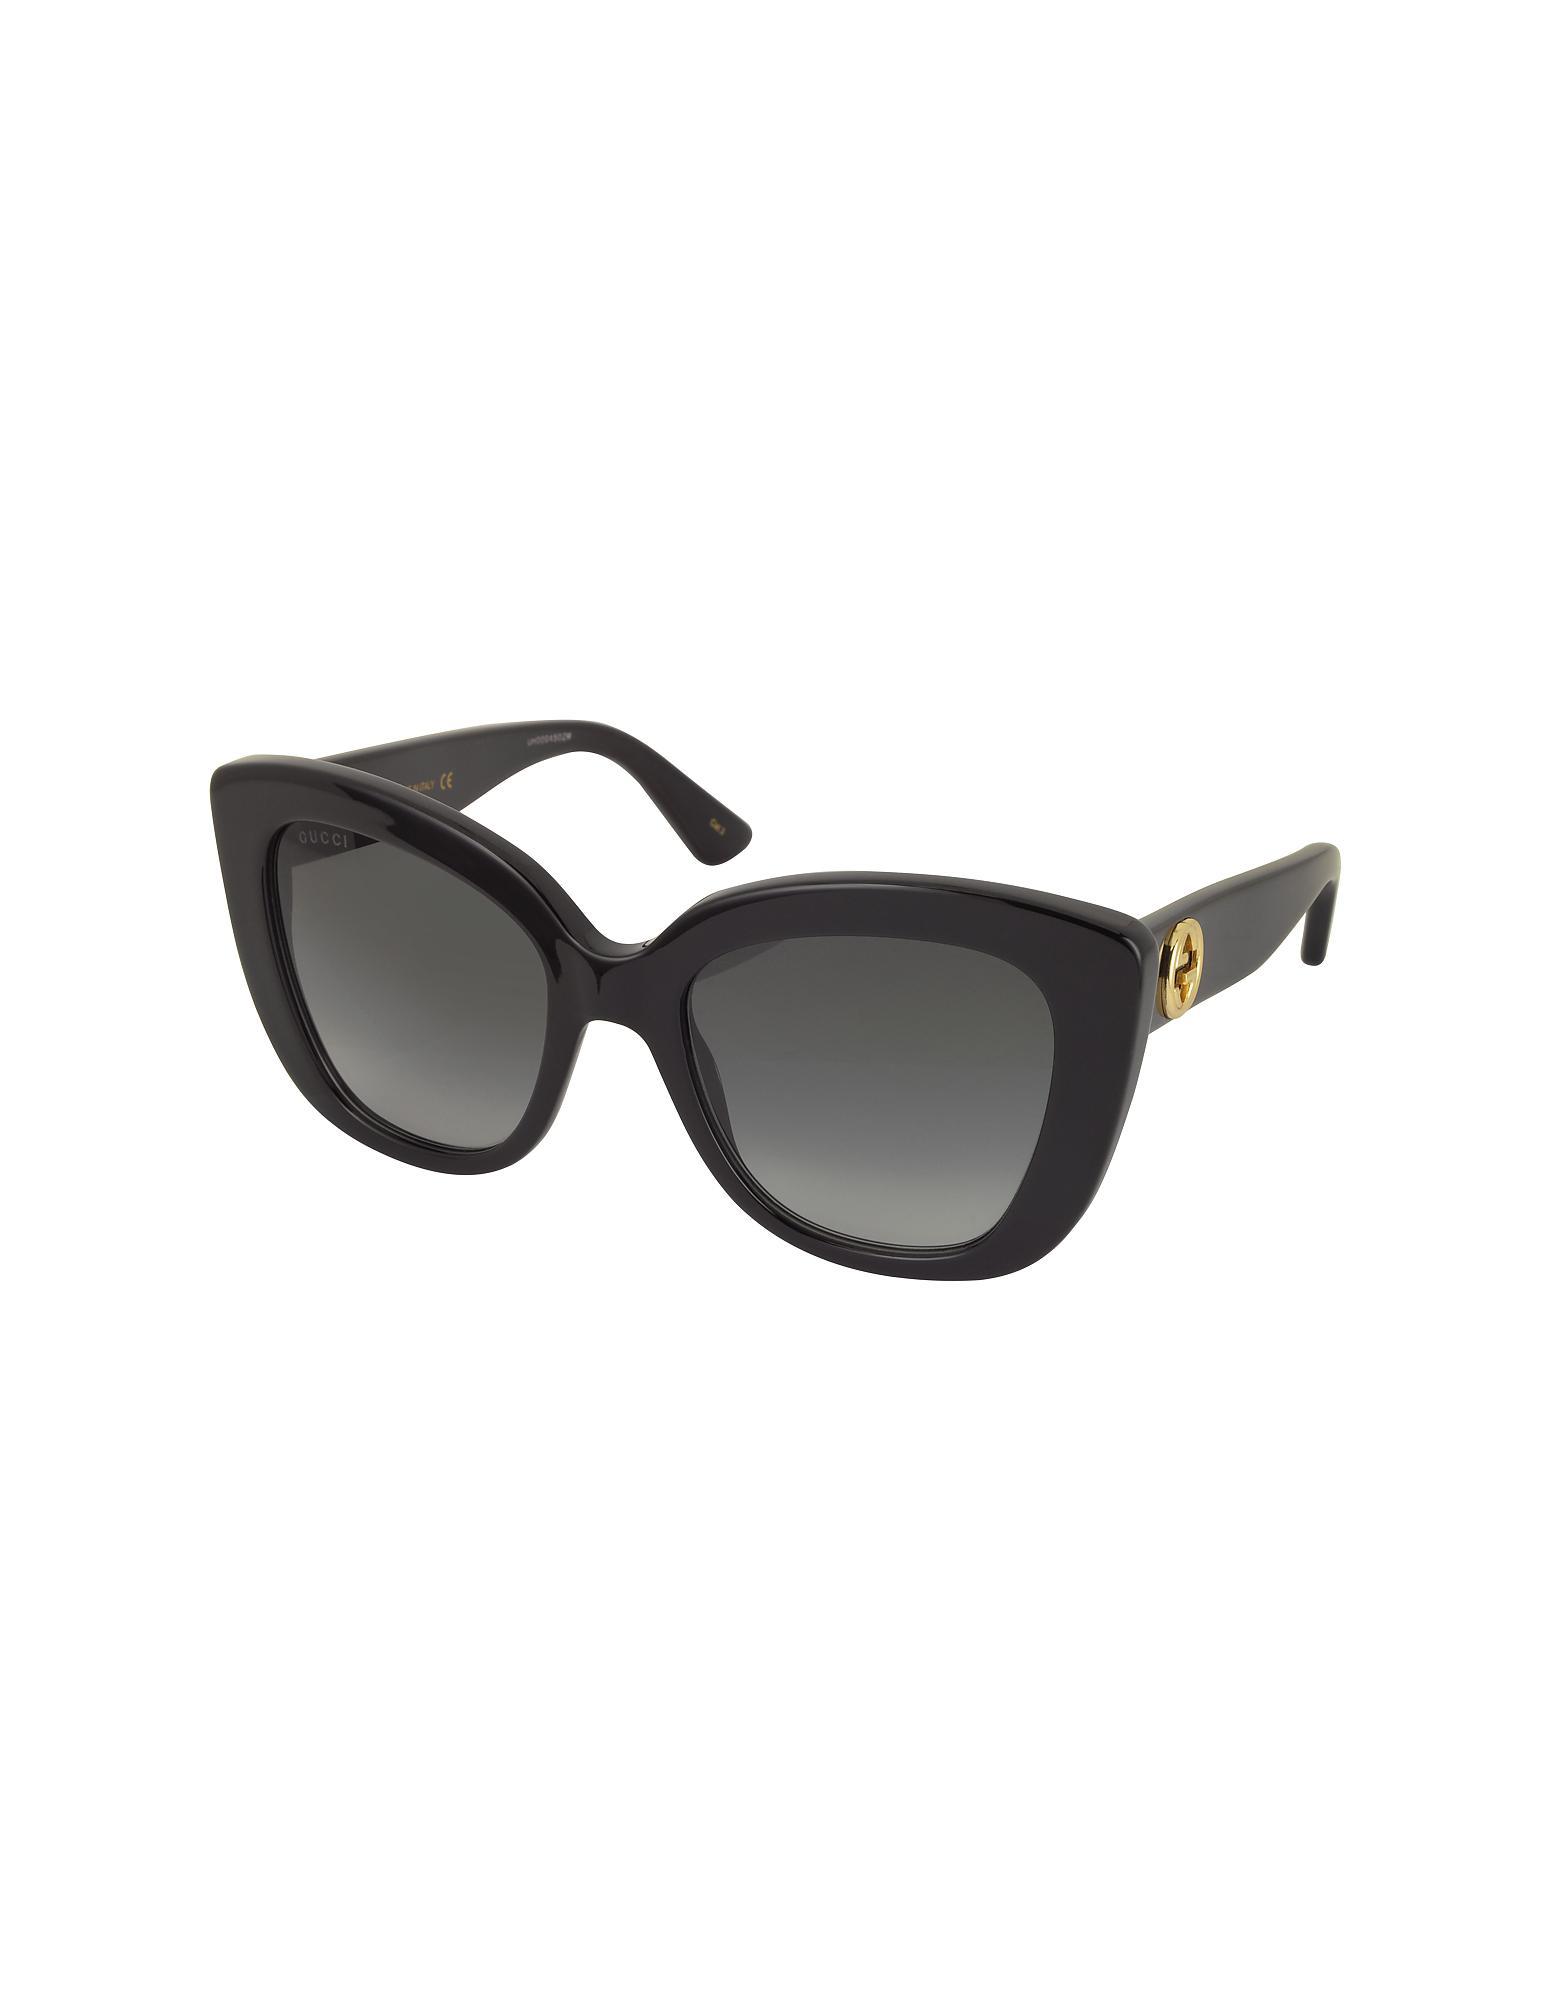 5e3d3cbcf04 Gucci Oversized Rectangular-frame Acetate Sunglasses in Black - Lyst